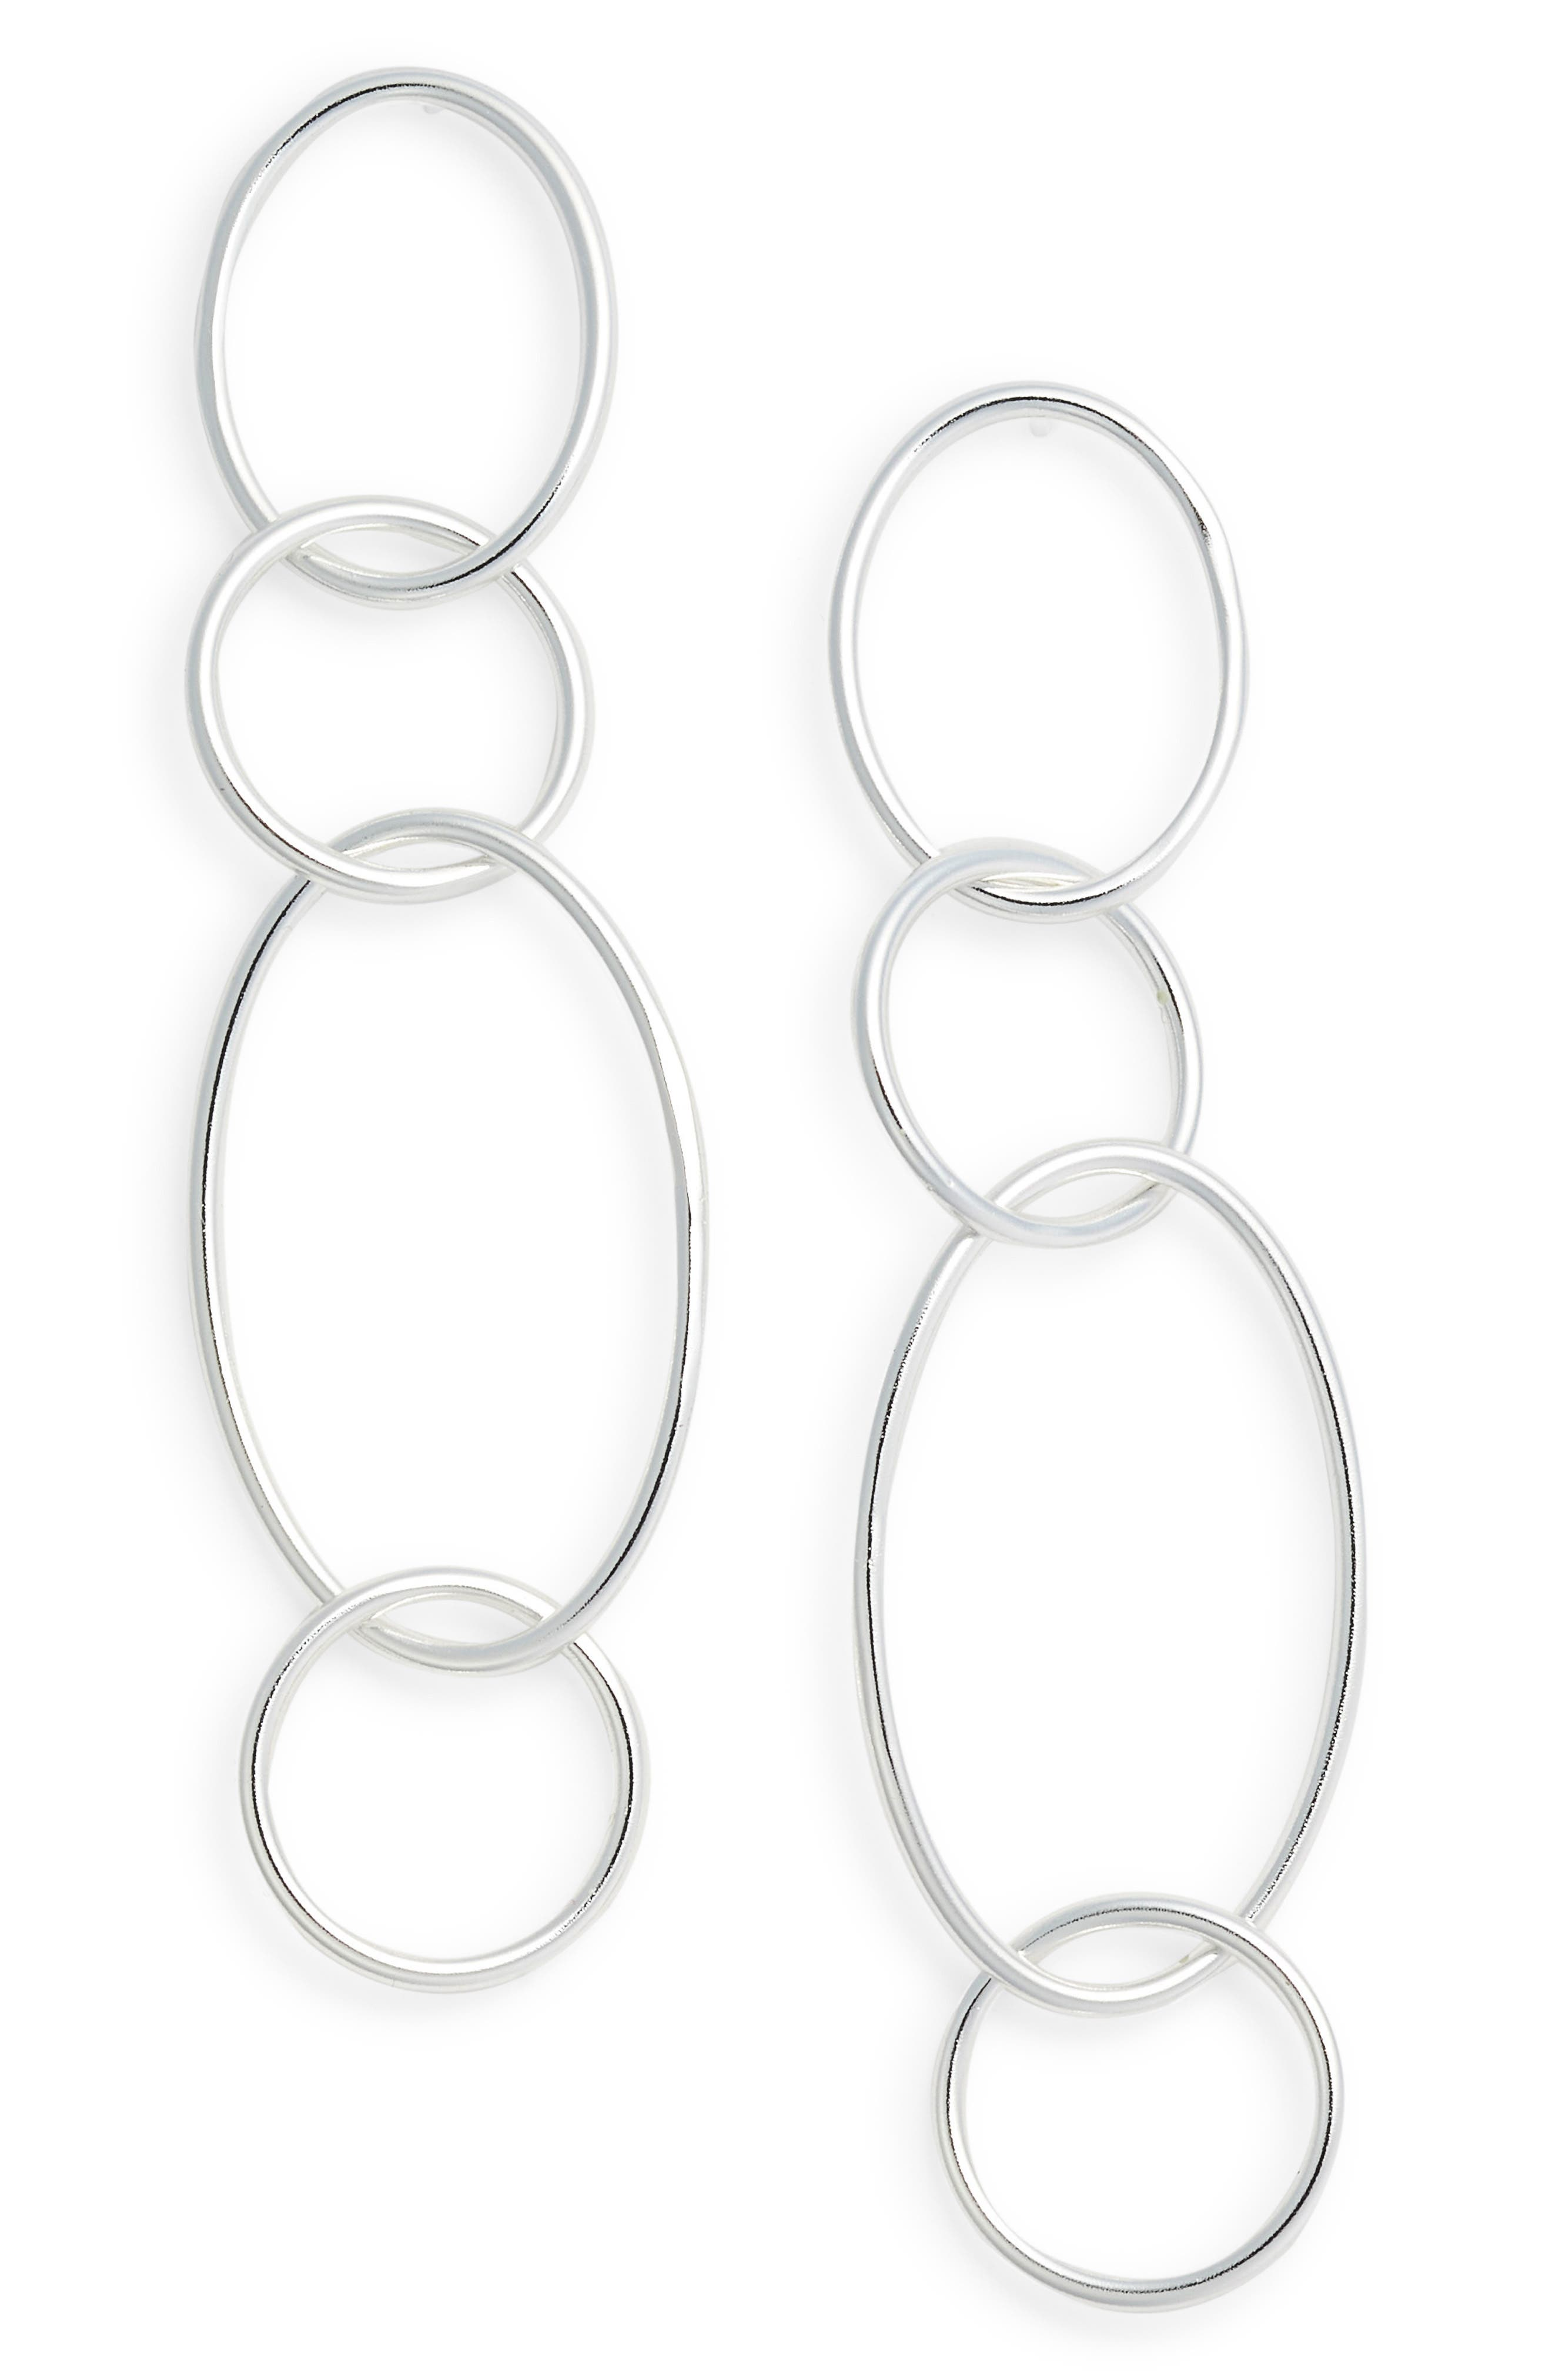 Drop Link Earrings,                             Main thumbnail 1, color,                             SILVER